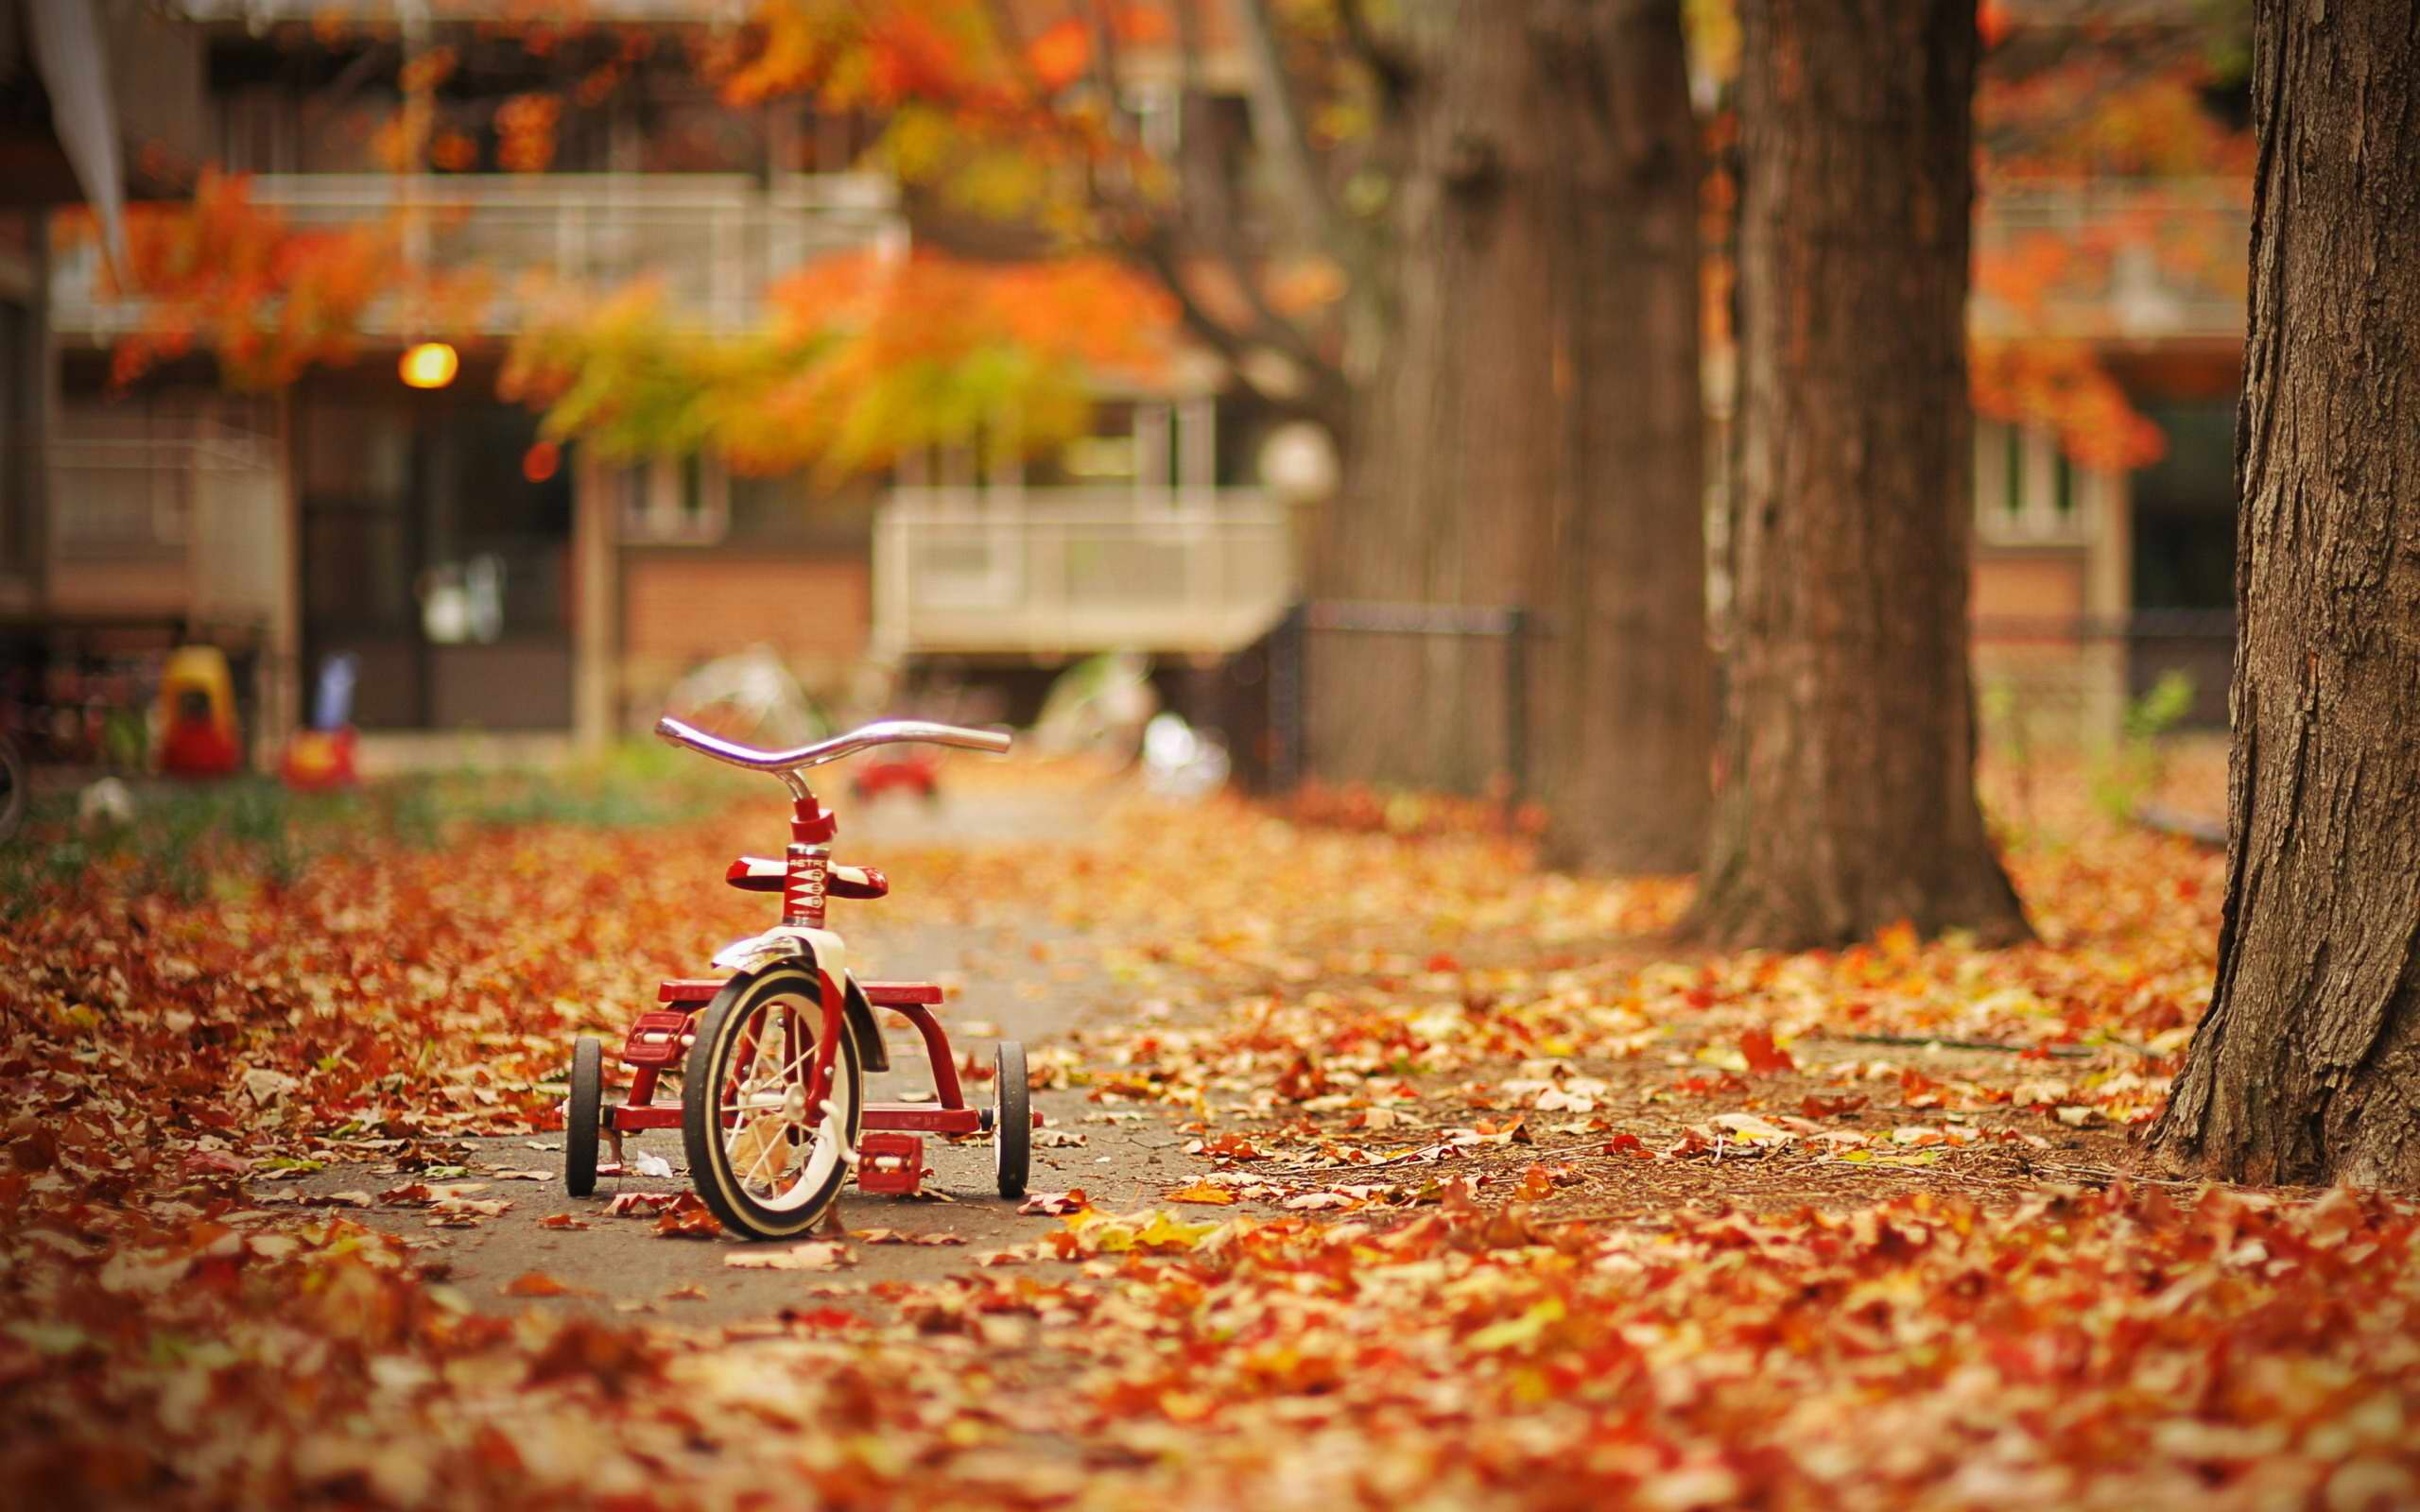 Osam razloga da dete provede napolju sat vremena svakog jesenjeg dana